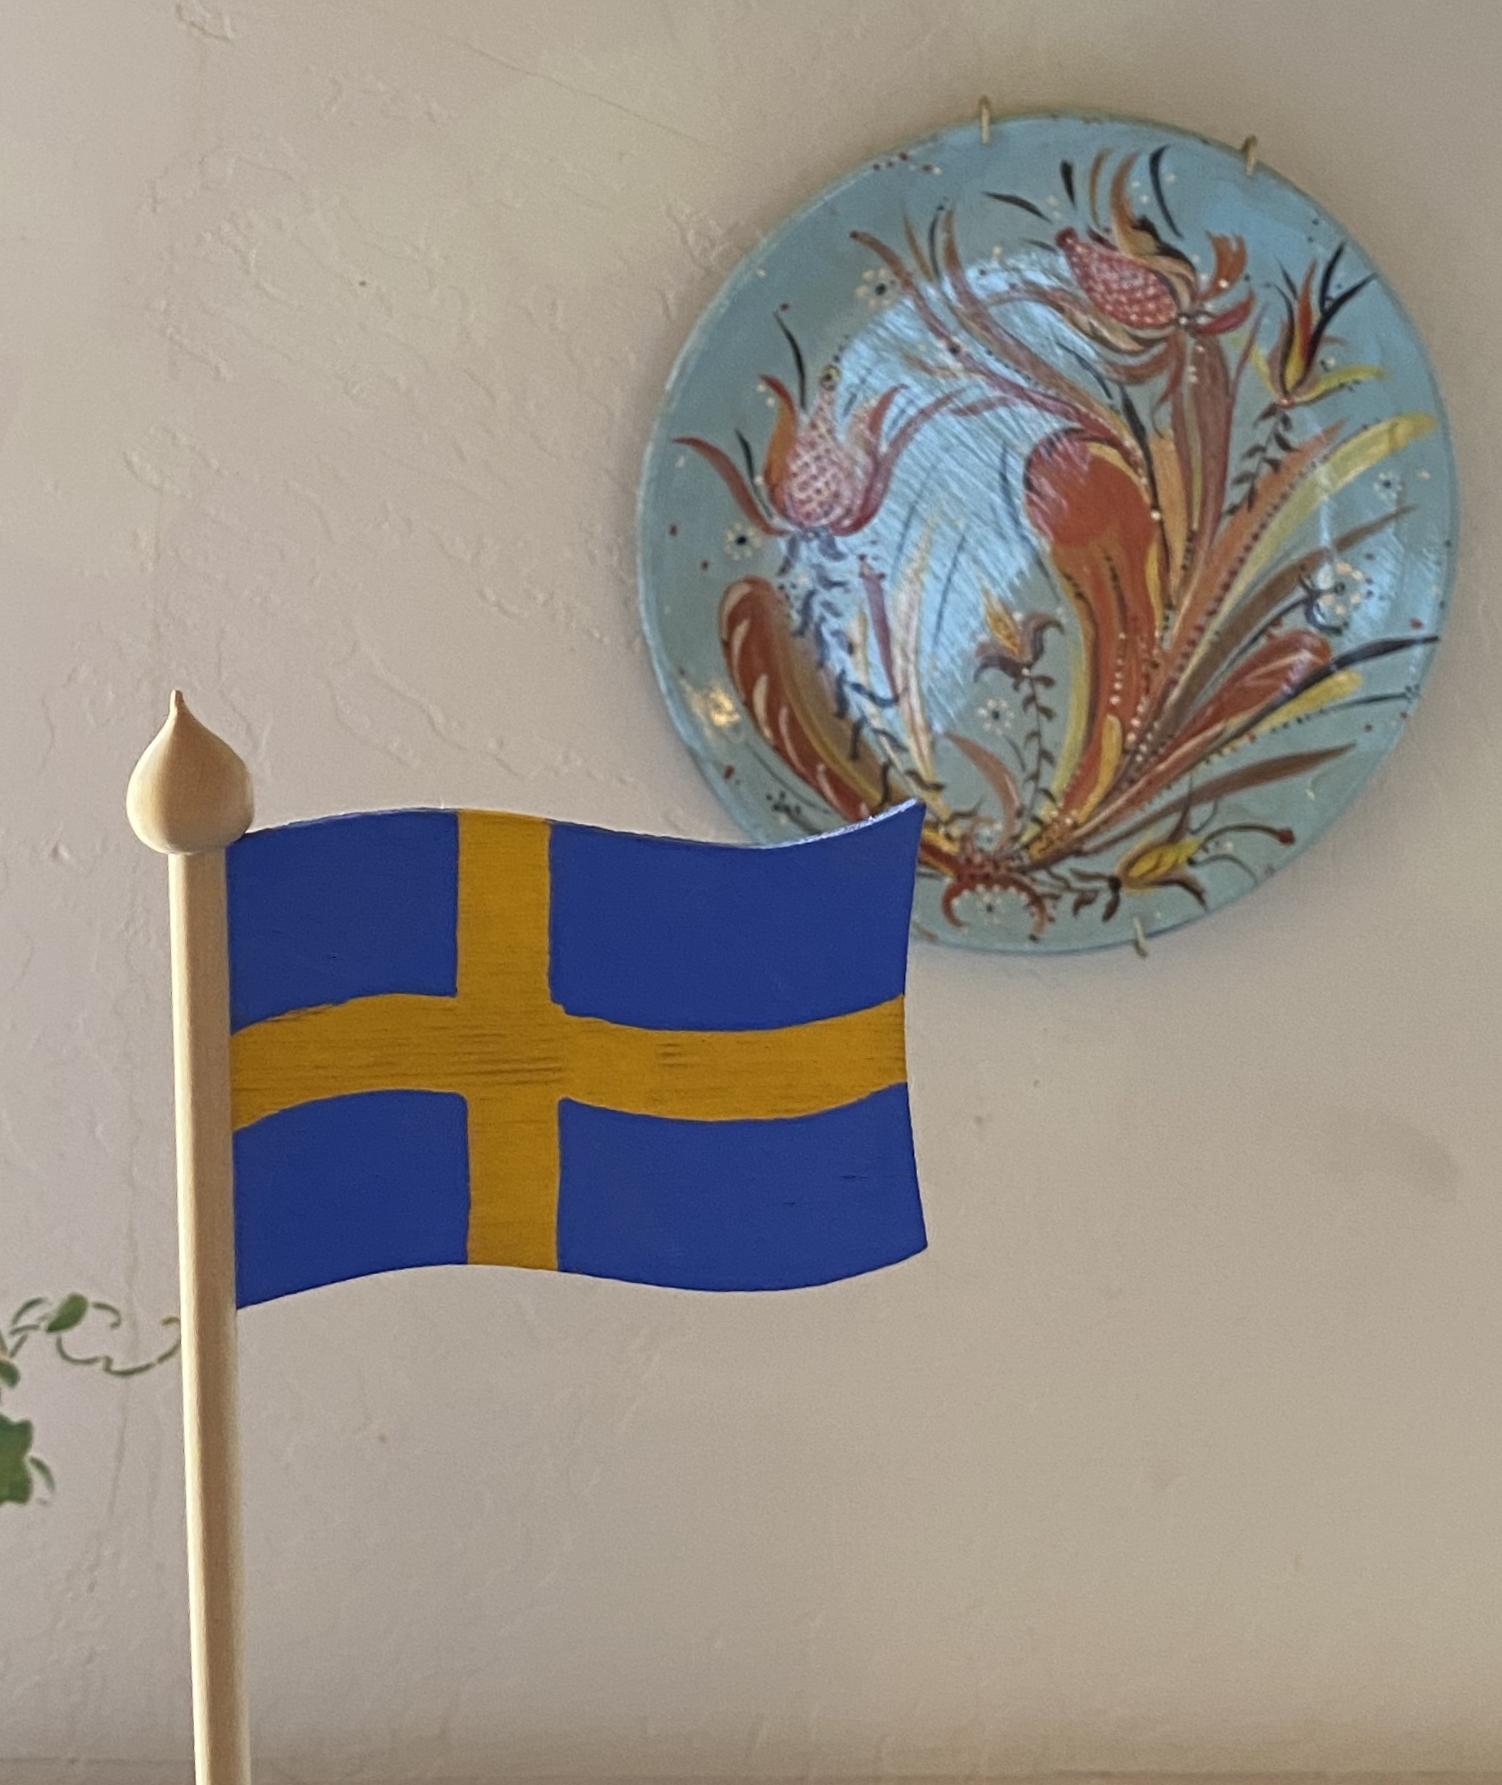 A Swedish flag in Grandmas Swedish Bakery, with Swedish folk art in the background